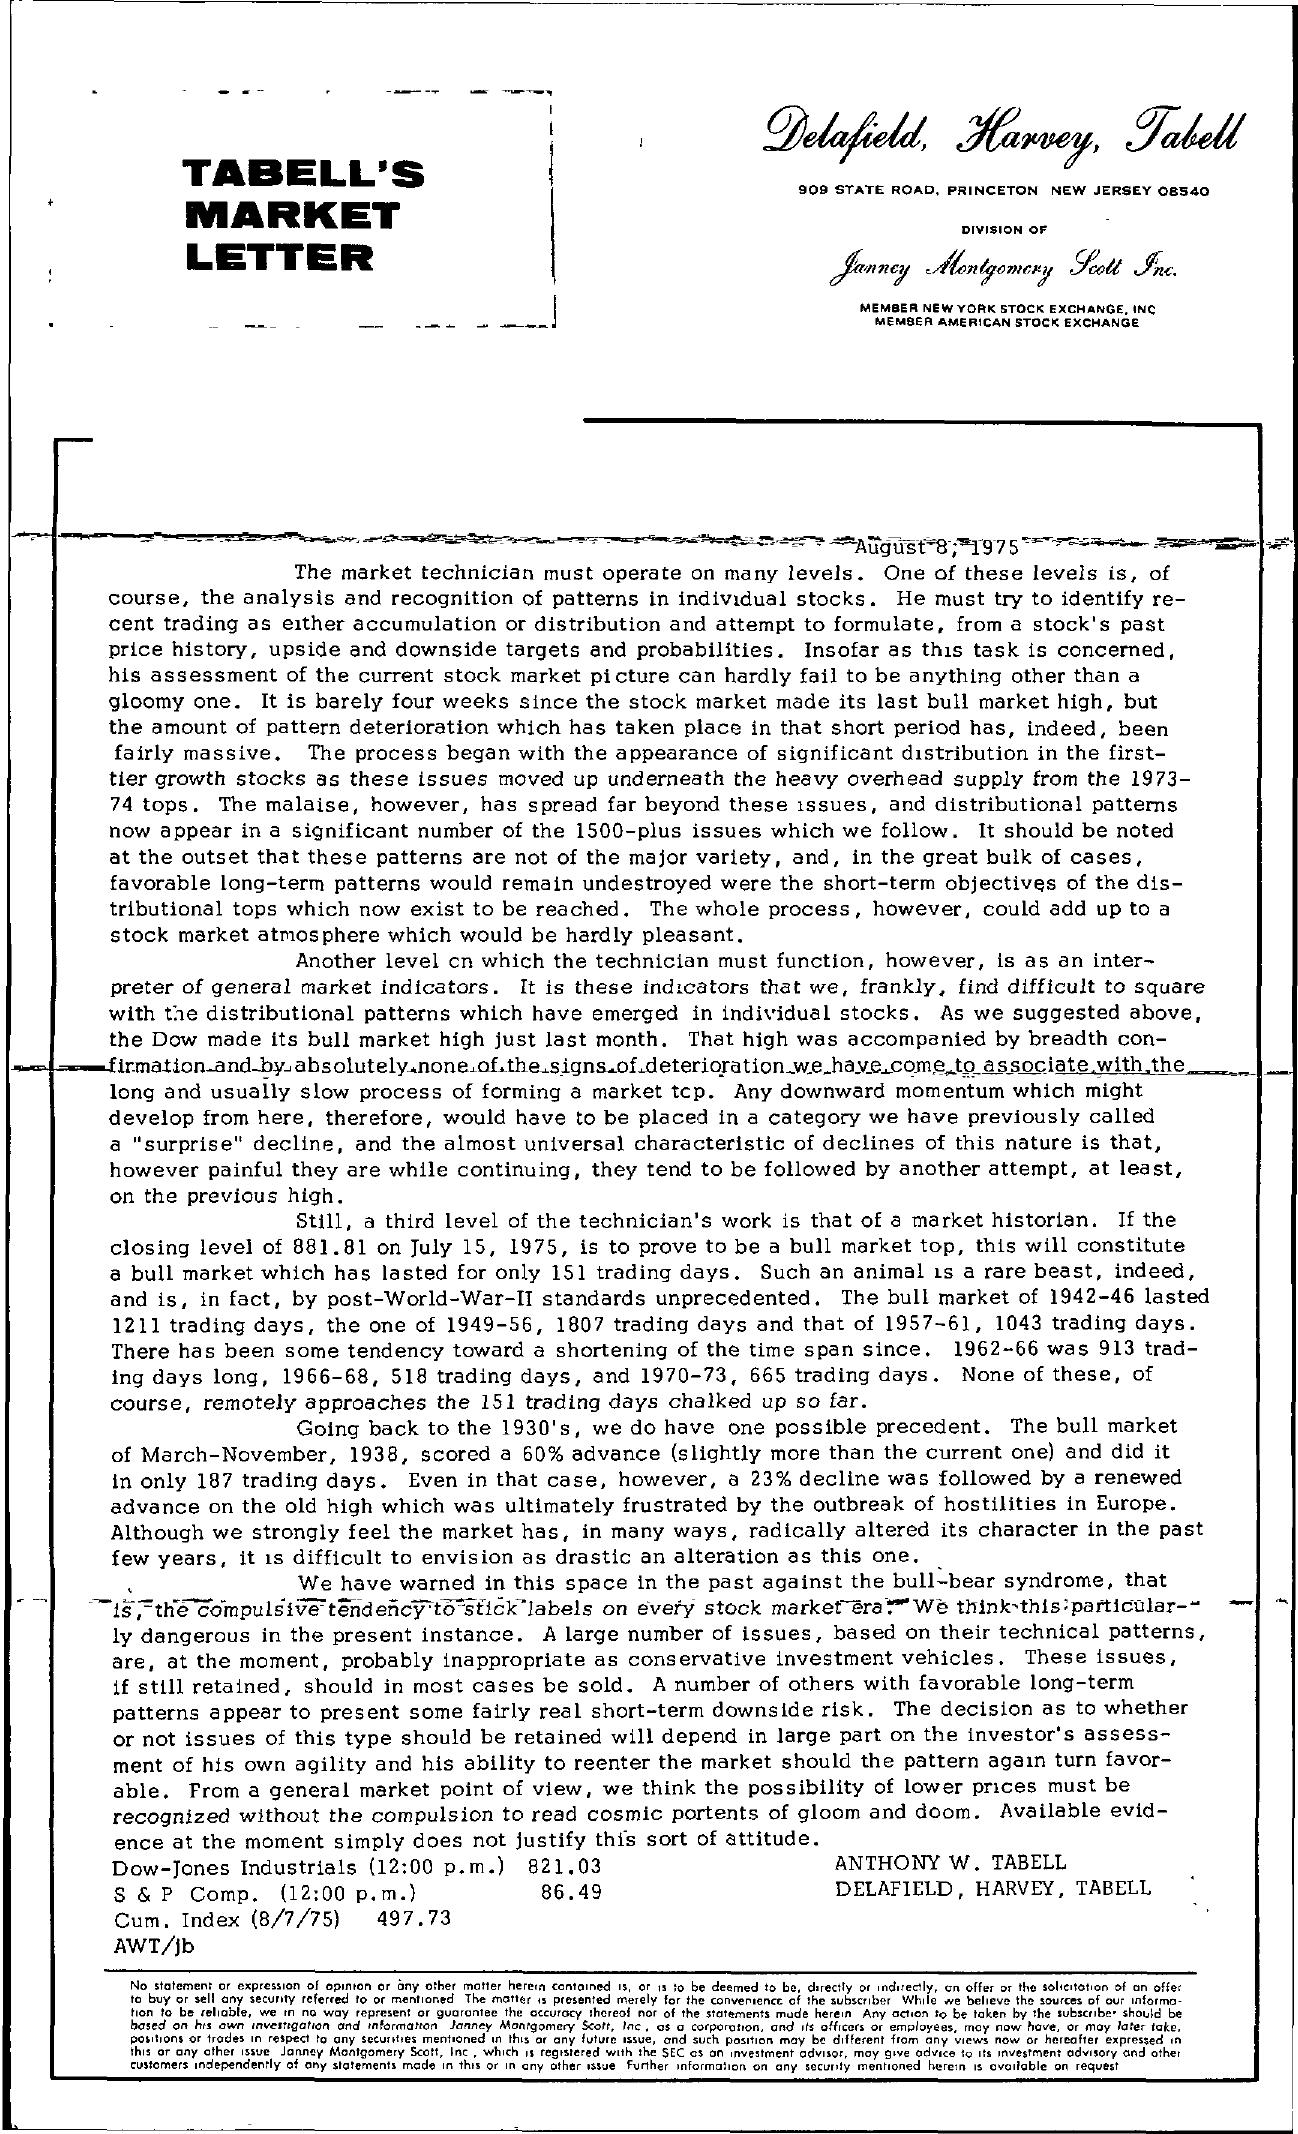 Tabell's Market Letter - August 08, 1975